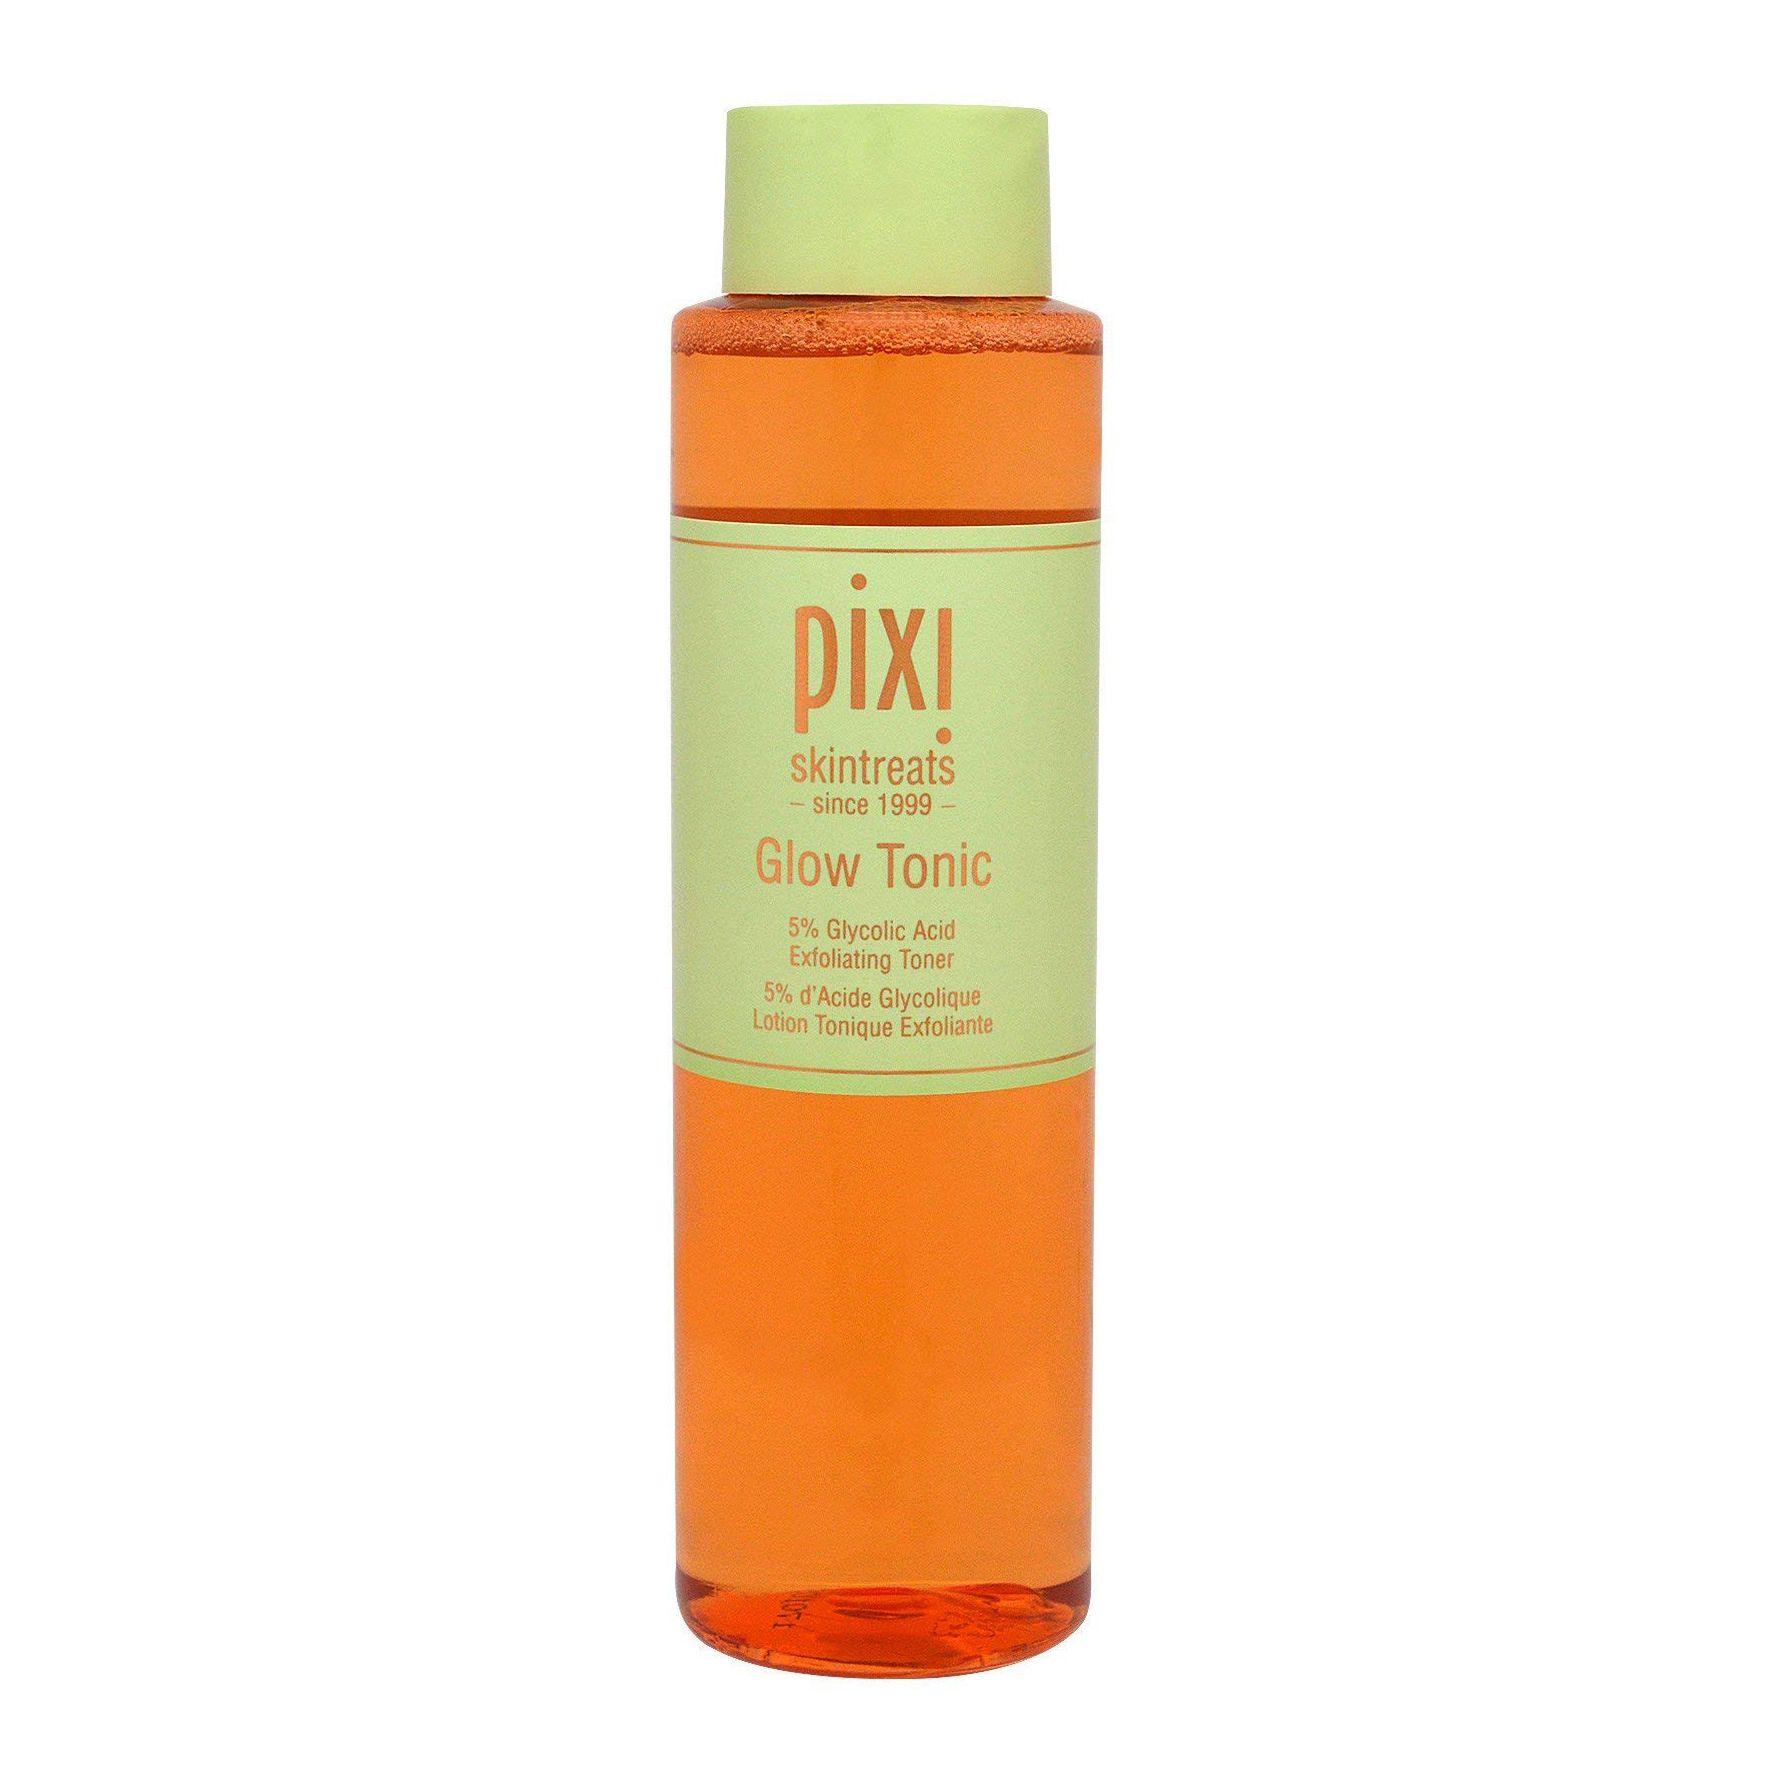 Pixi Skintreats Glow Tonic Exfoliating Toner 250ml